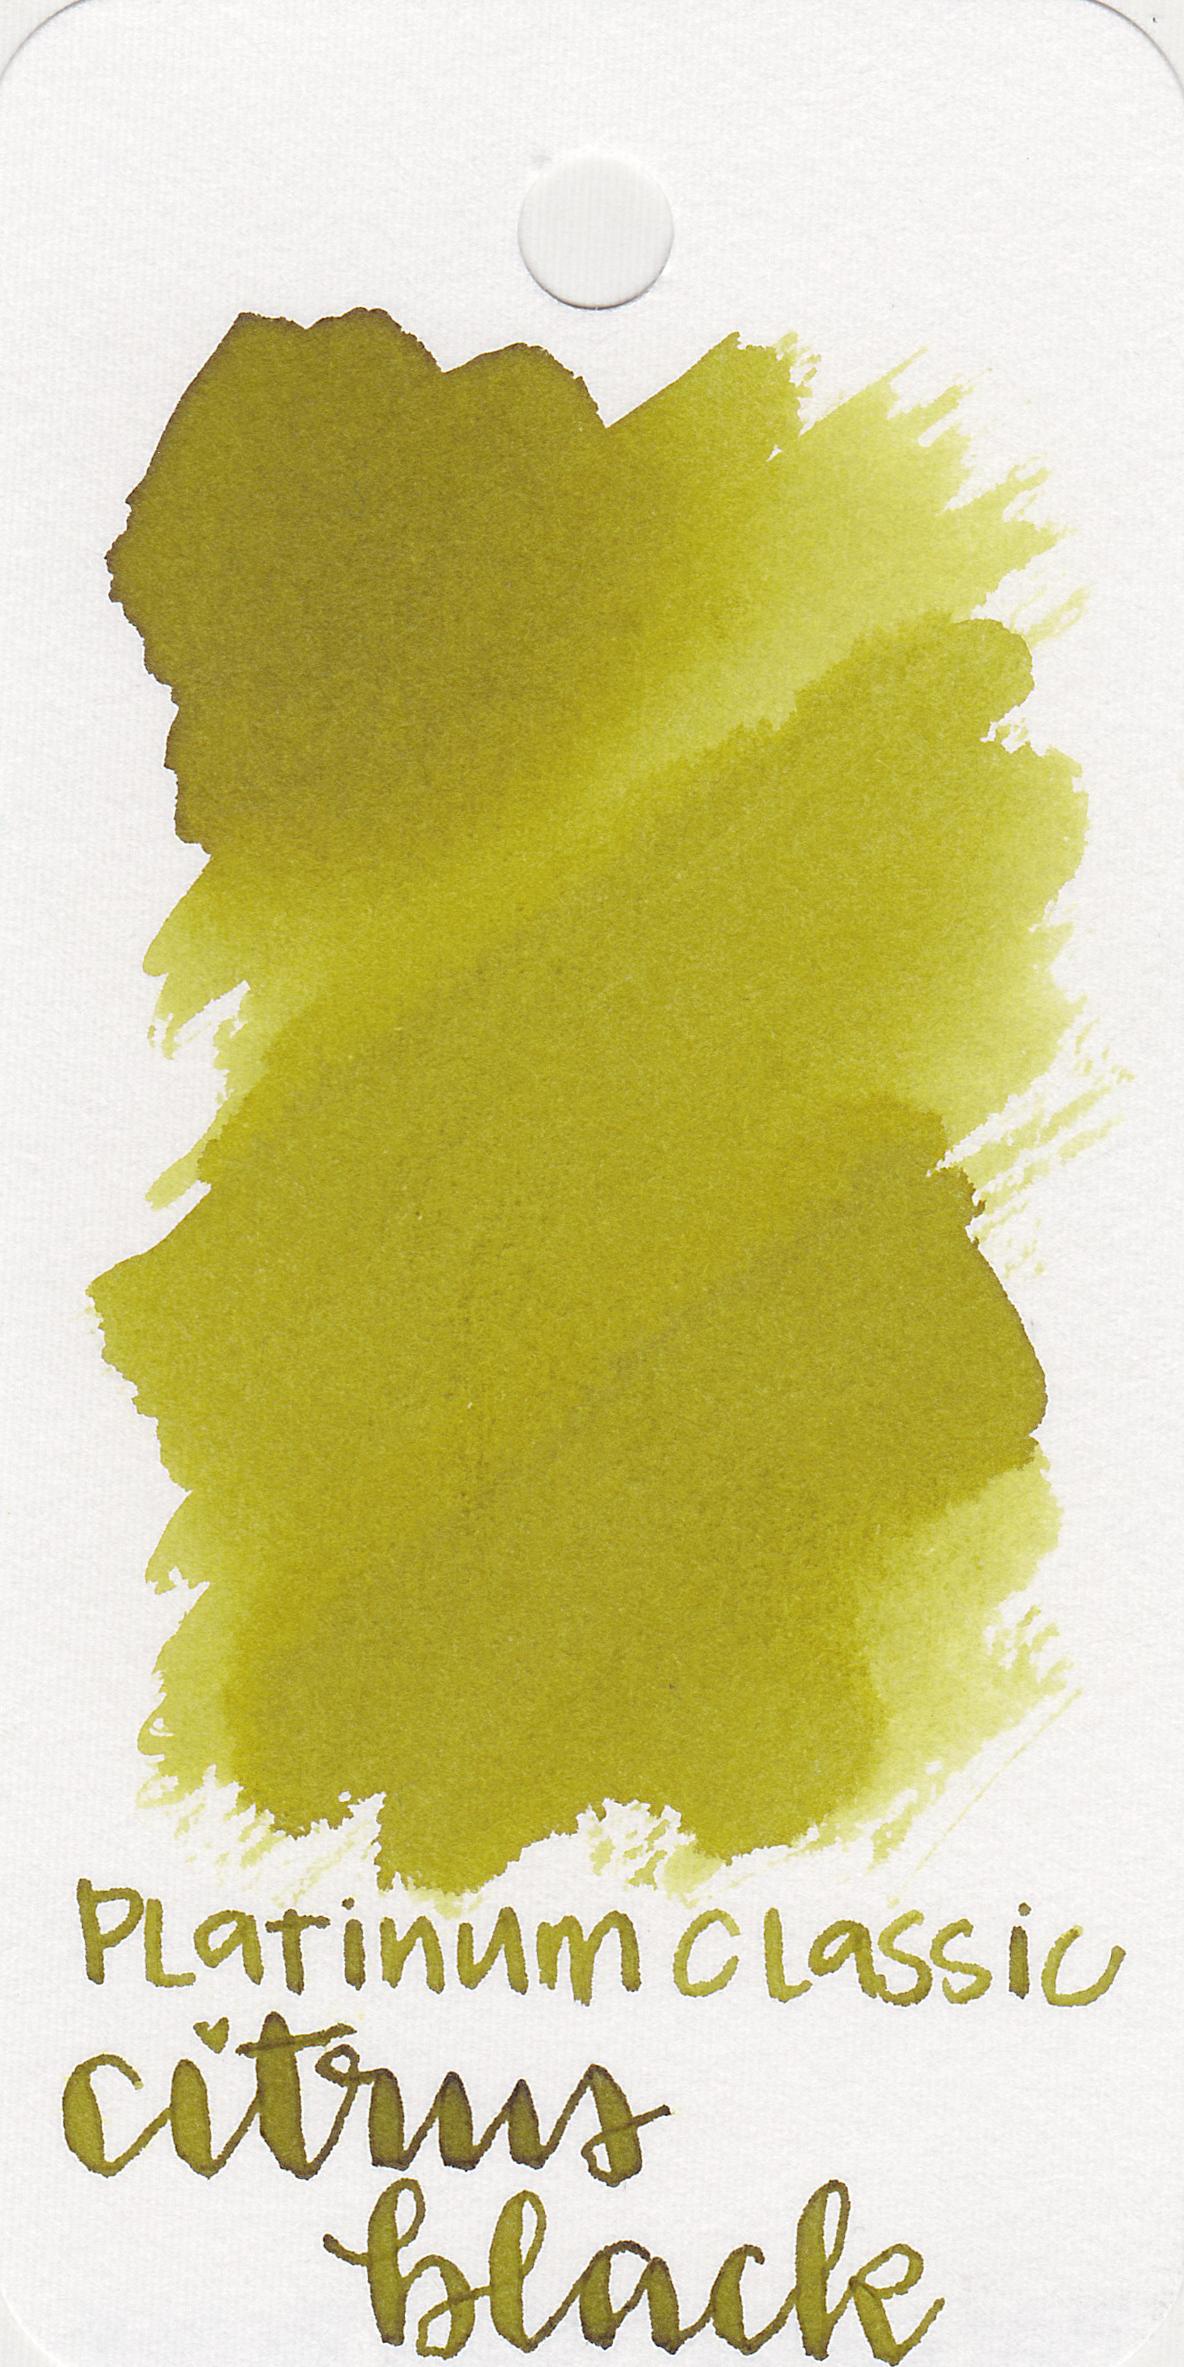 pl-citrus-black-1.jpg